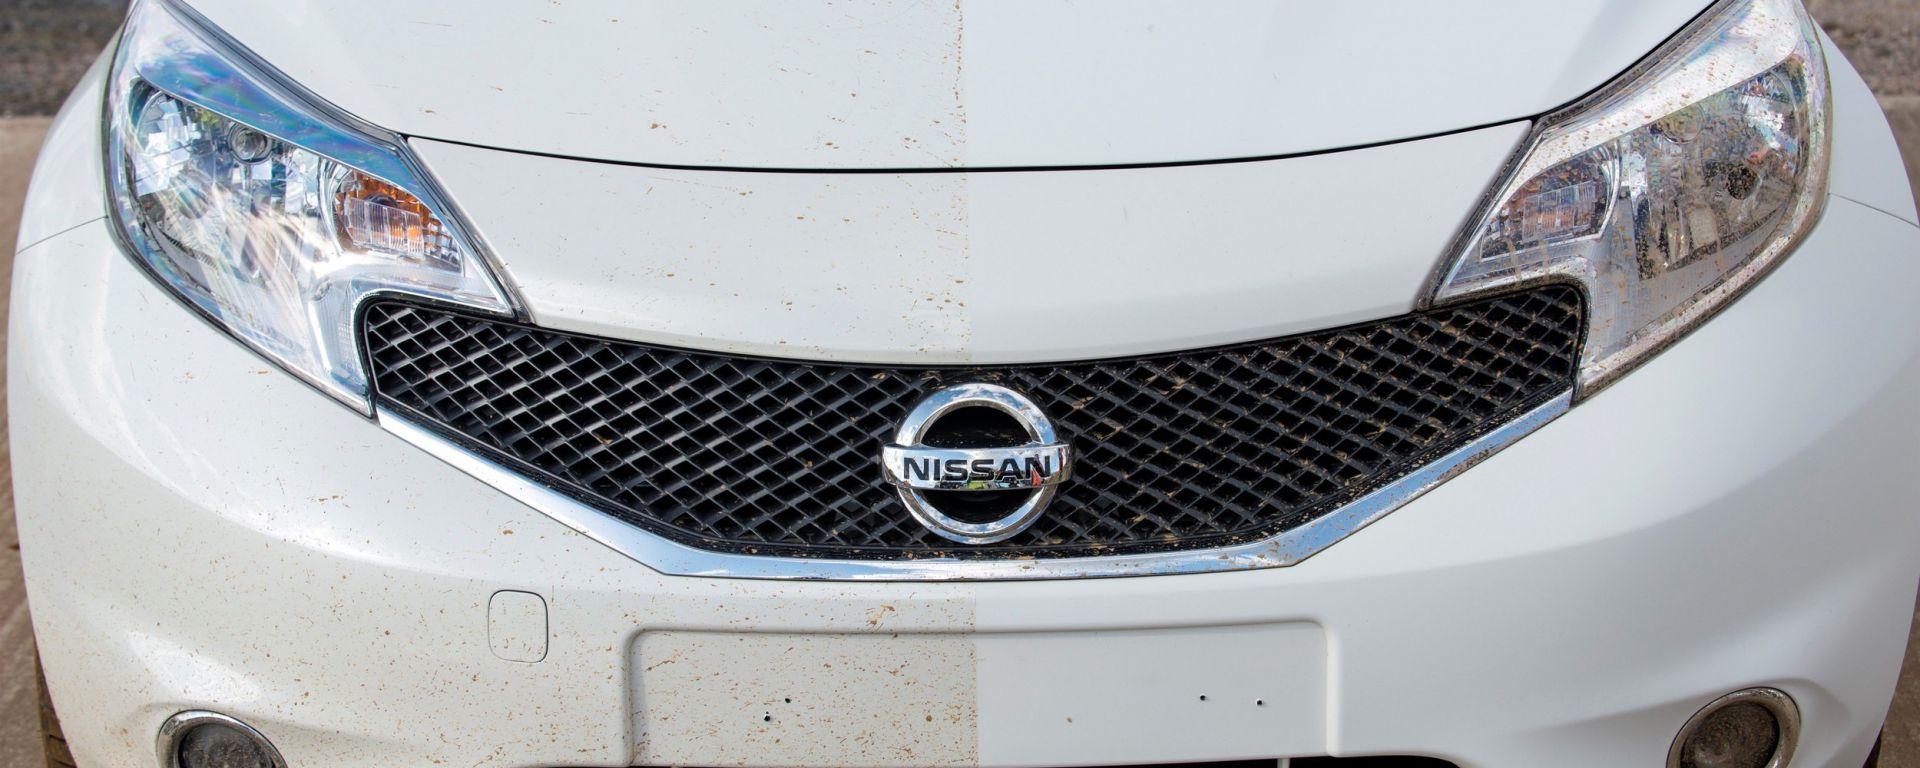 Nissan: arriva la vernice anti-sporco